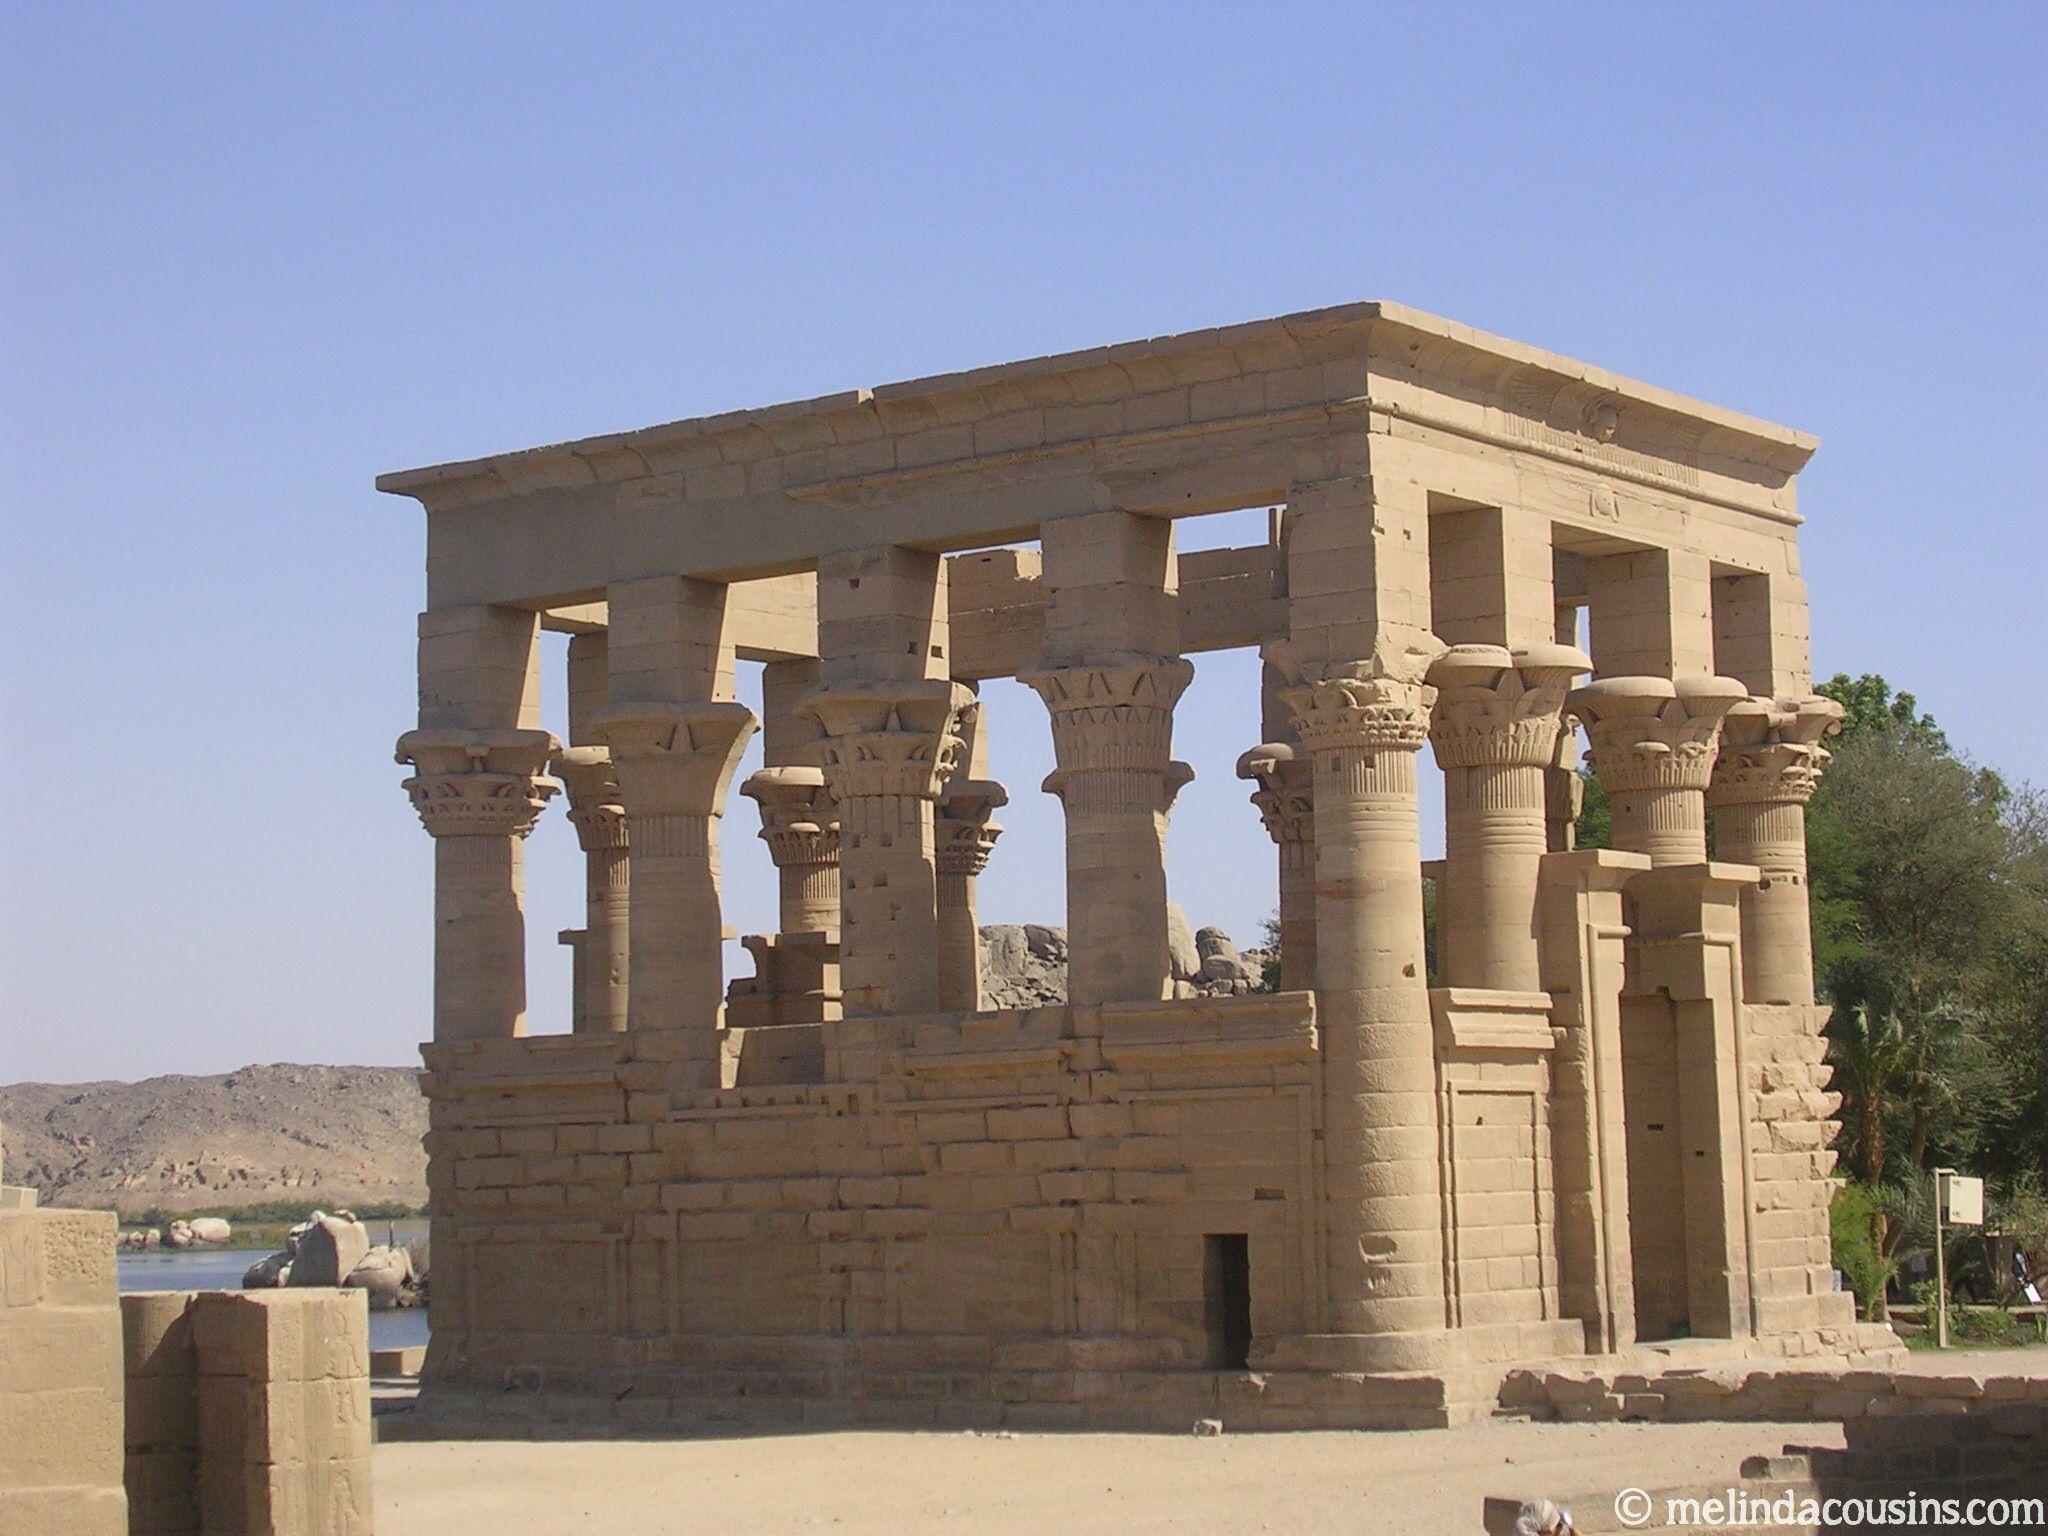 Egyptian Architecture Style dscf21681322800834319 (3726×2357) | egypt architecture